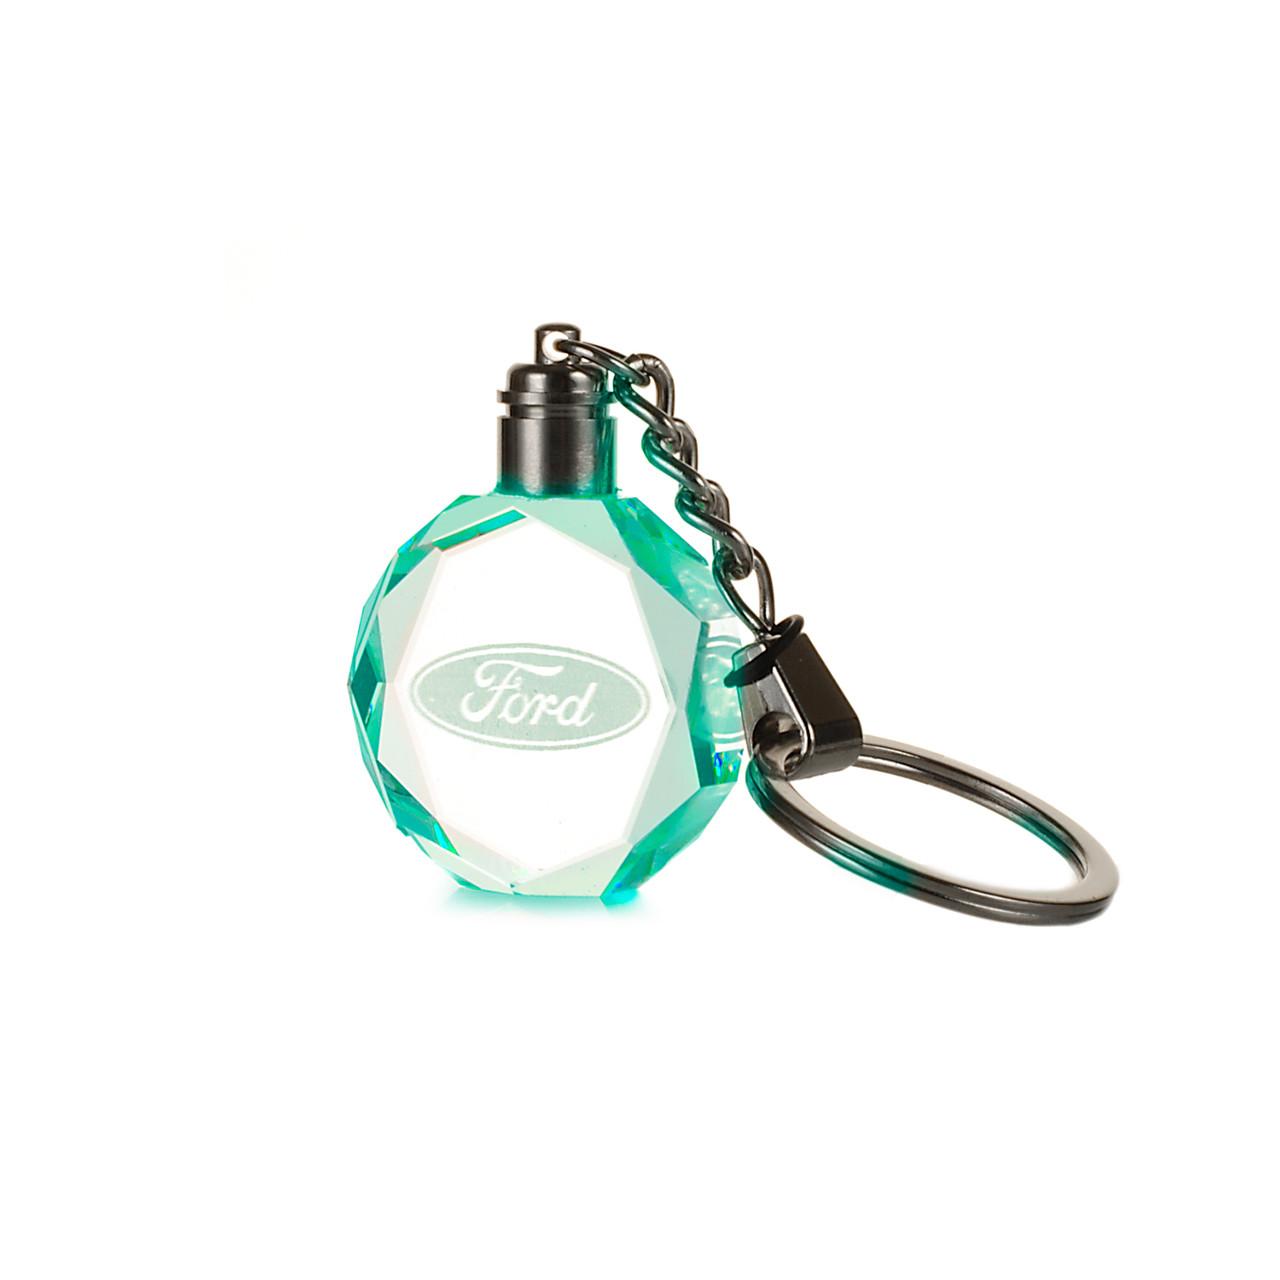 Брелок c подсветкой Motowey Ford Прозрачный (Ford LED)